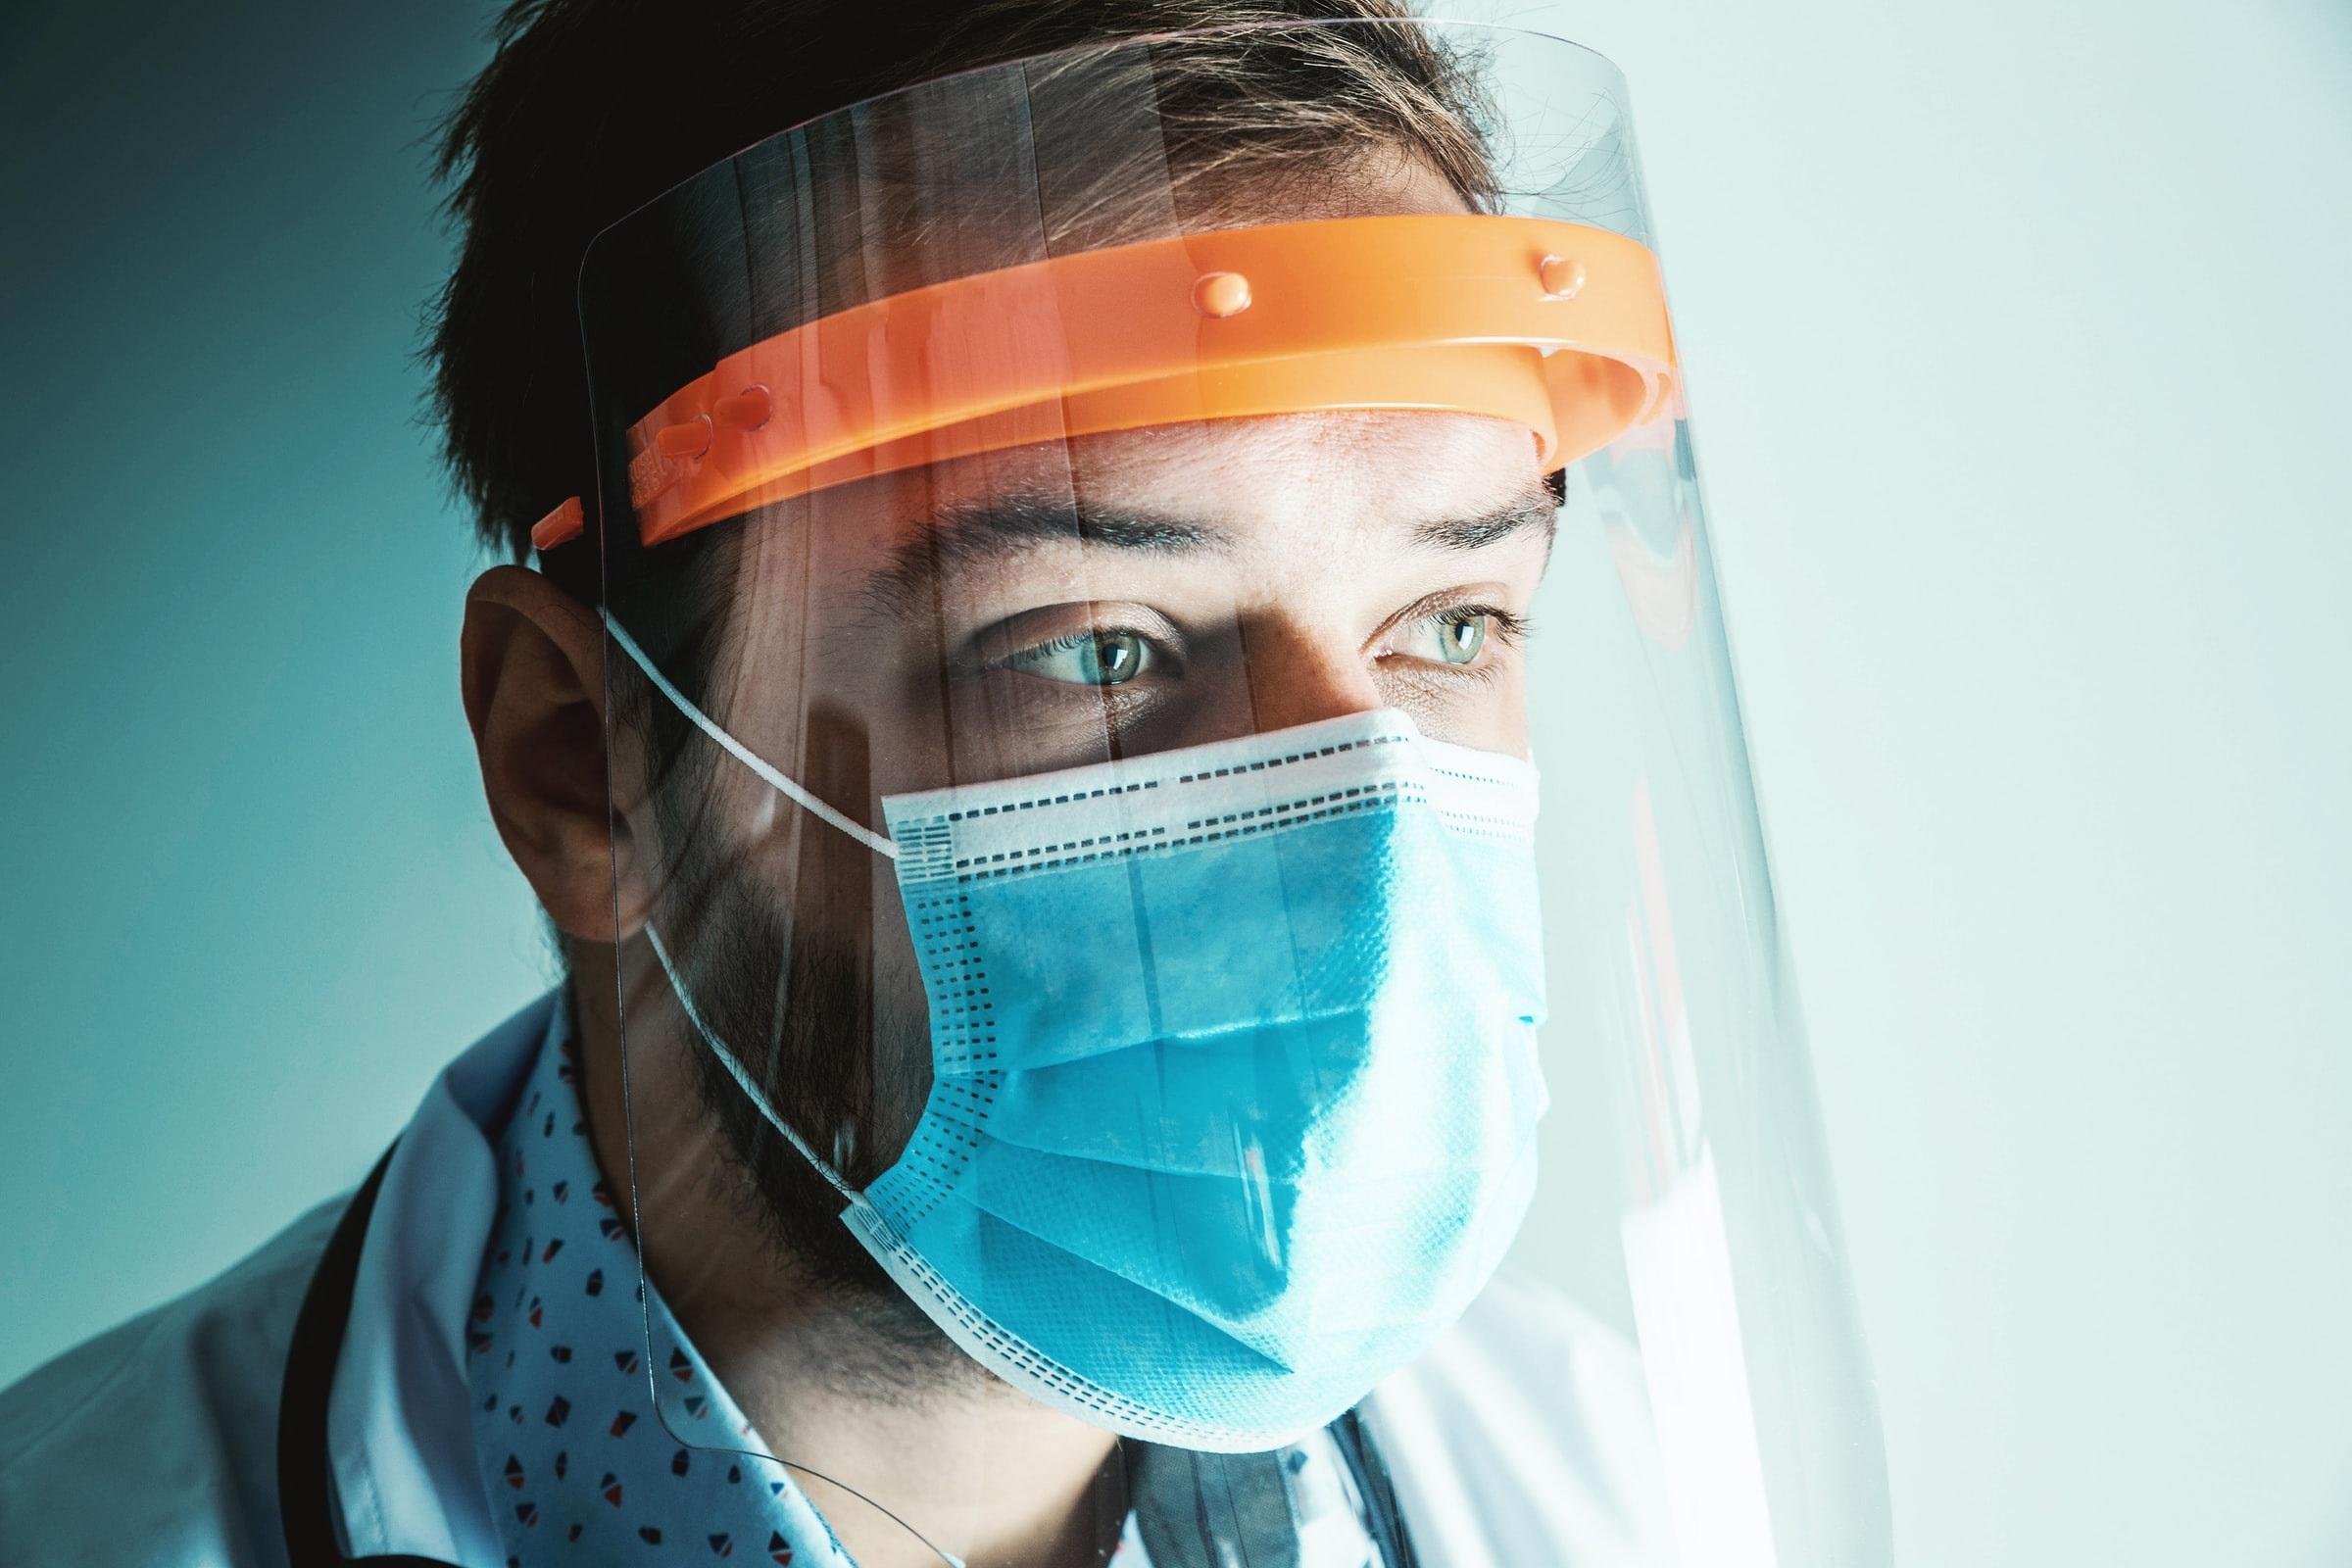 COVID-19, coronavirus, masque, visière.